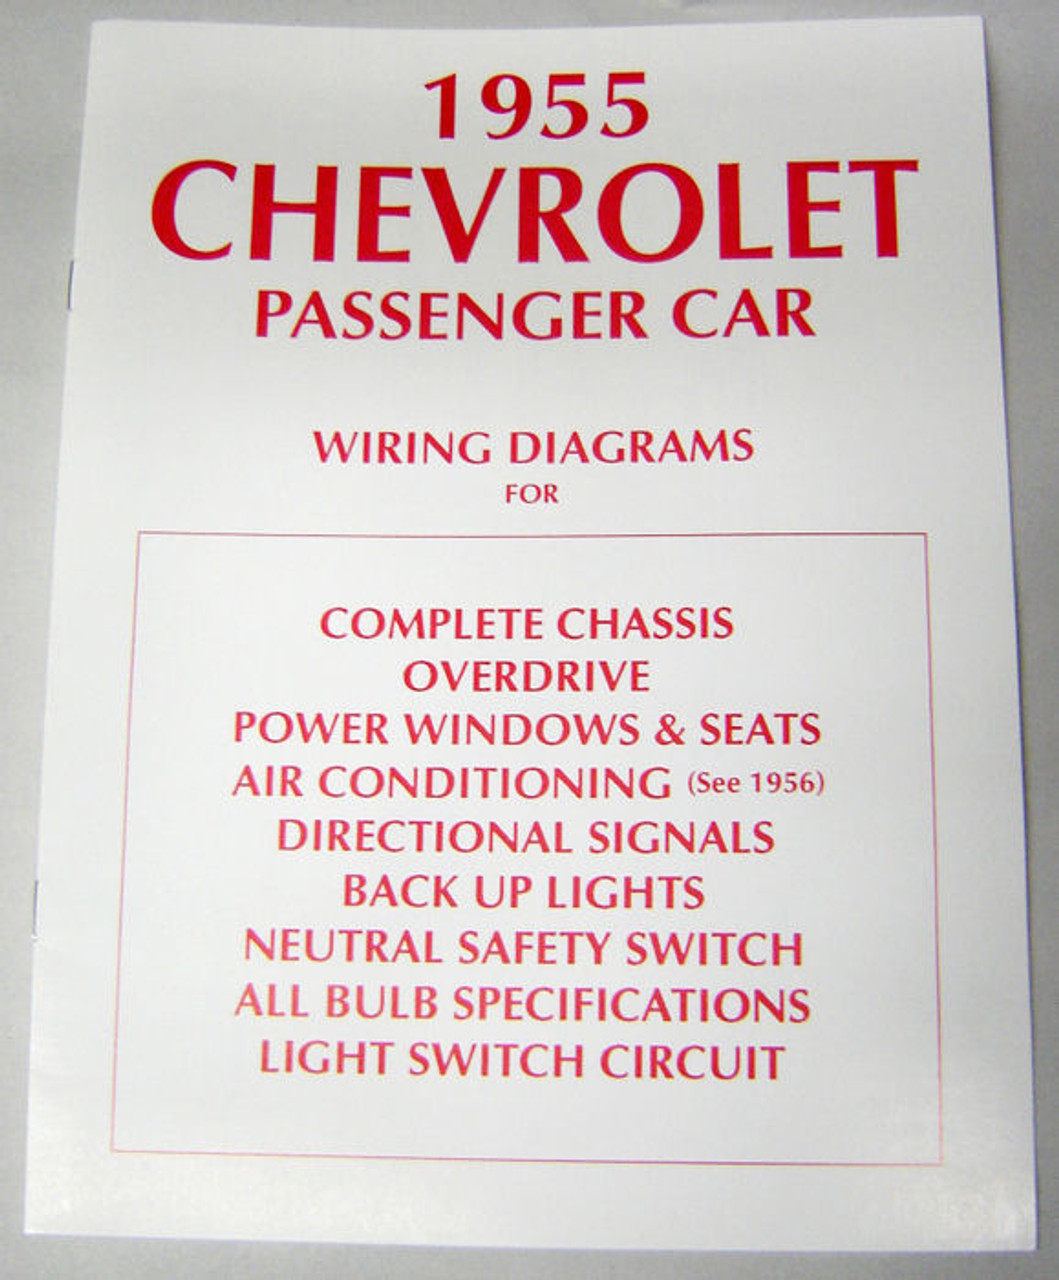 L1000_zpsbamkugxp__90195.1443295376?c\=2 56 chevy ignition switch wiring wiring diagrams 1965 chevy ignition switch wiring diagram at readyjetset.co